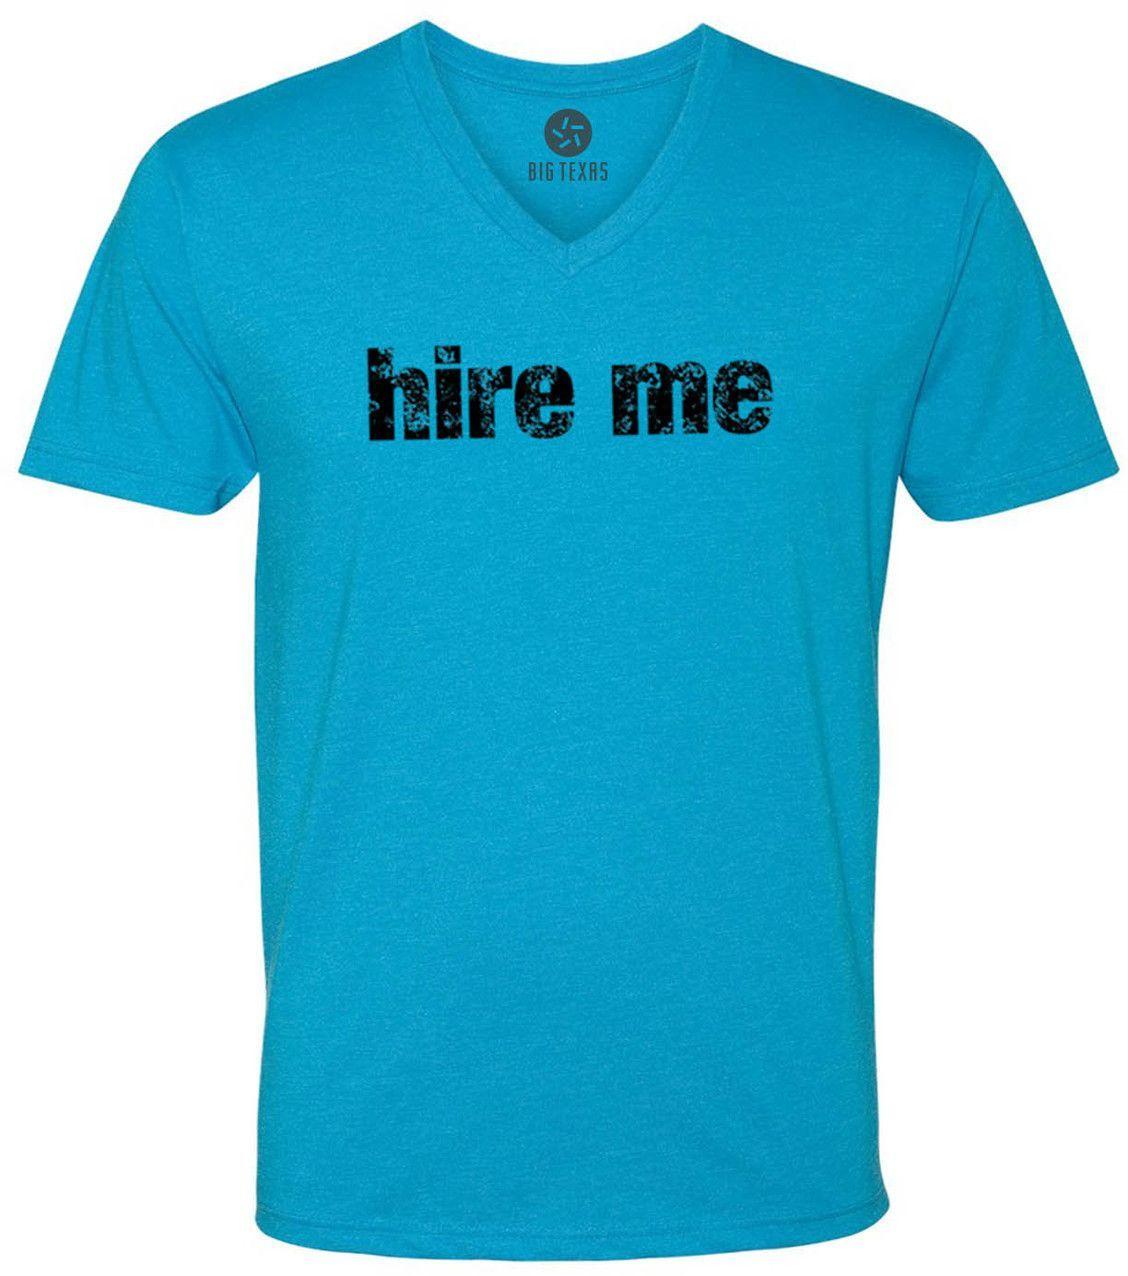 Hire Me (Black) Short-Sleeve V-Neck T-Shirt